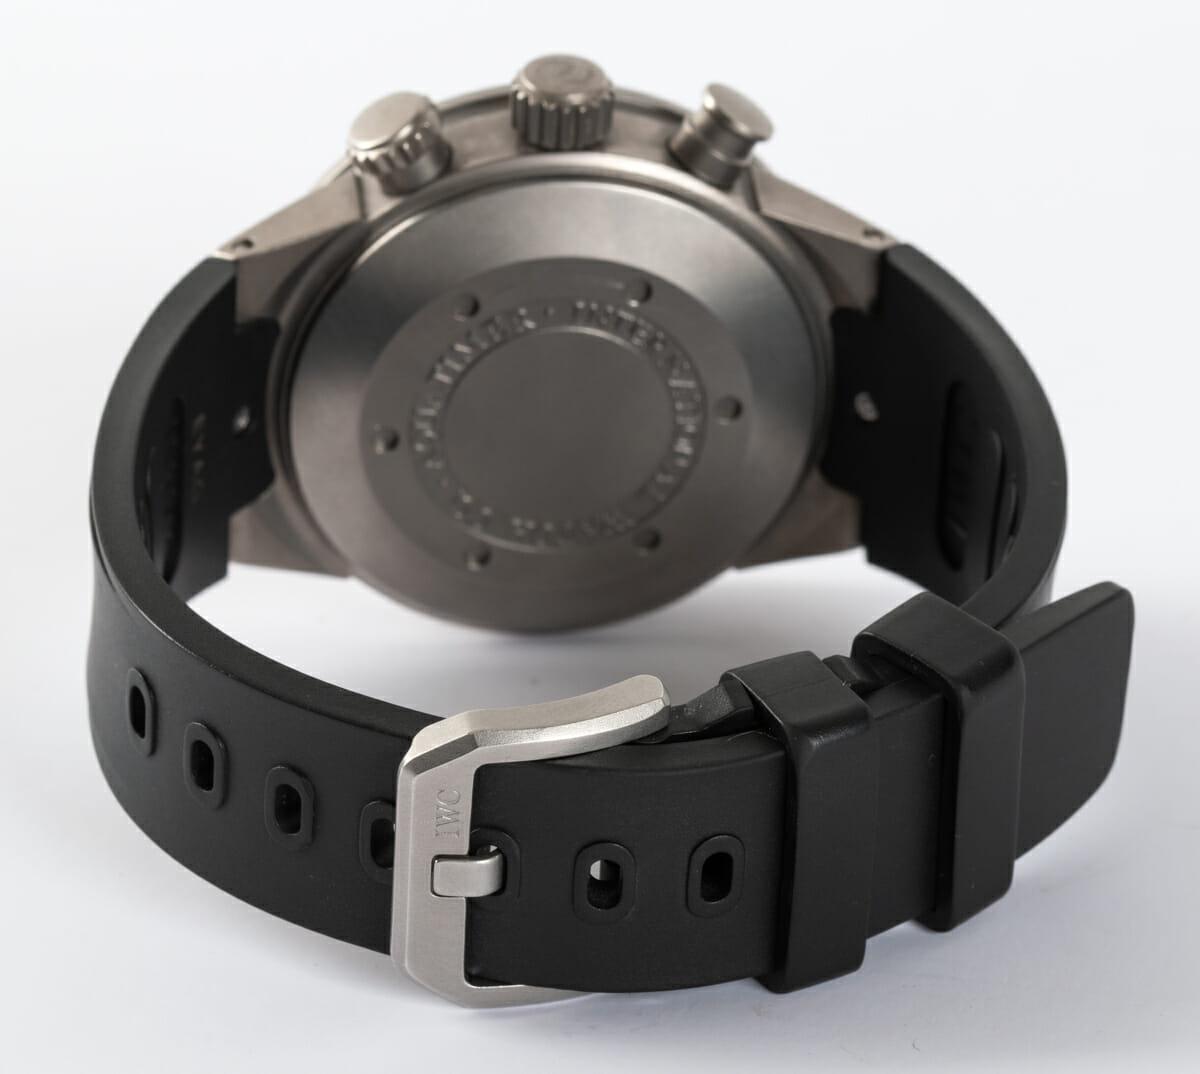 Rear / Band View of Aquatimer Chrono-Automatic